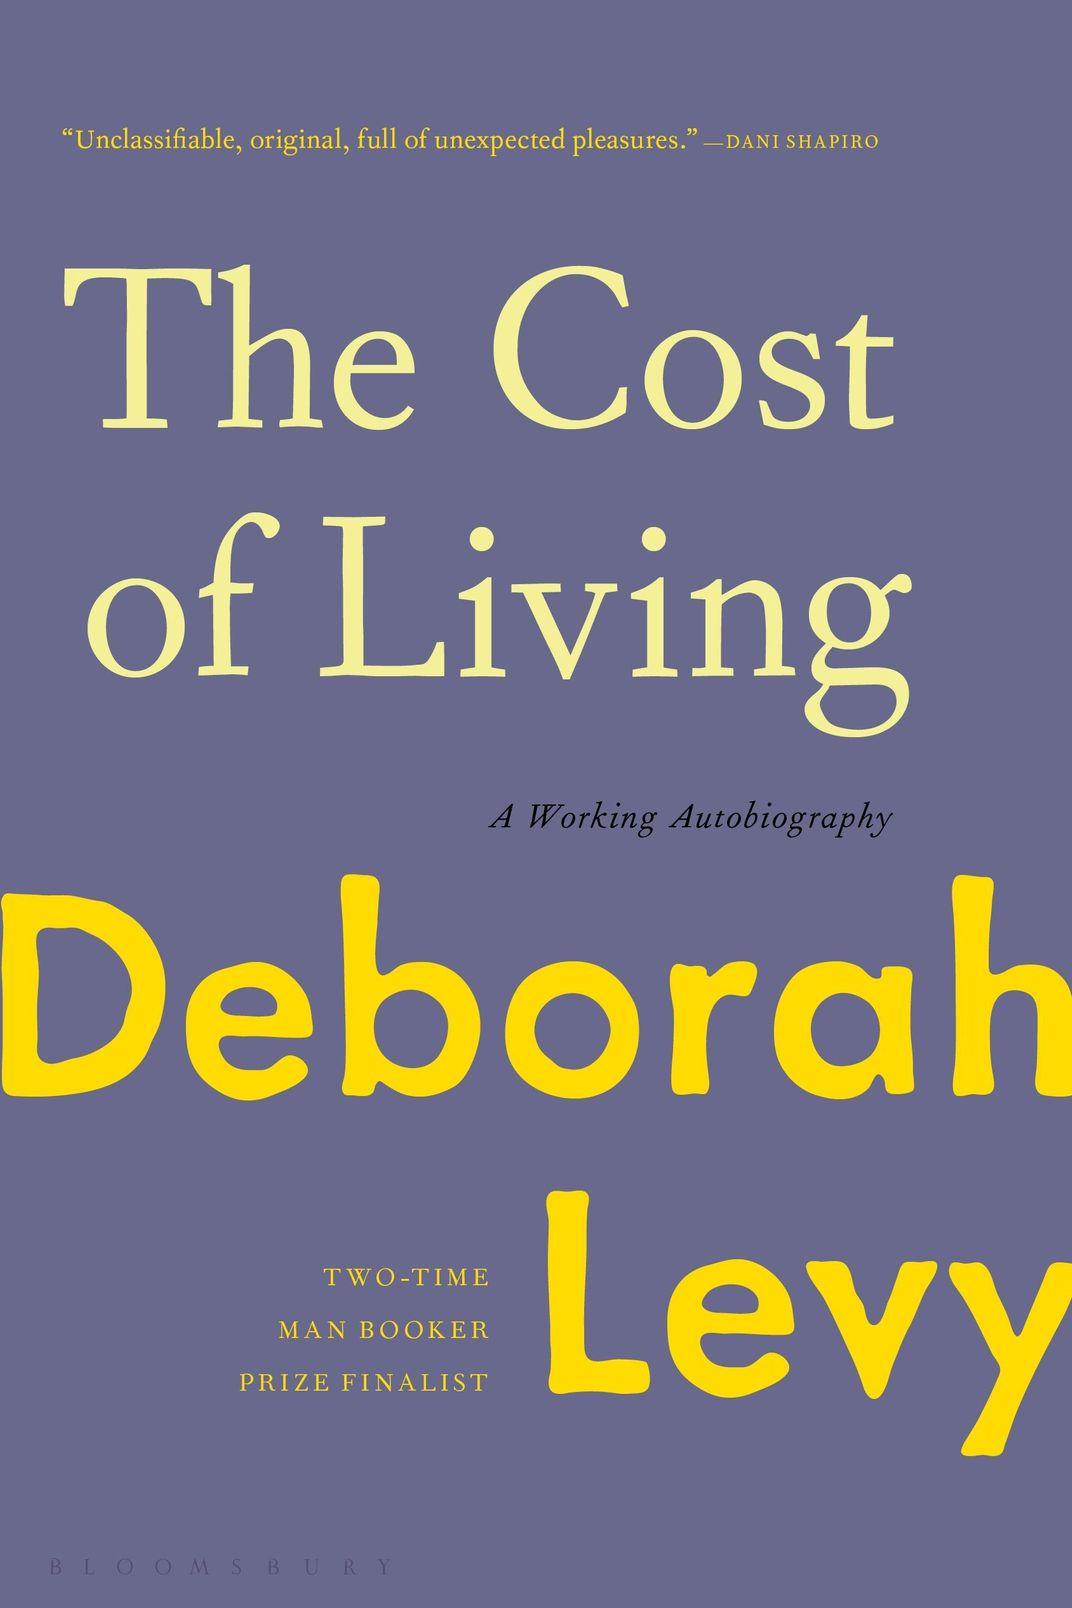 <em>The Cost of Living</em>, by Deborah Levy